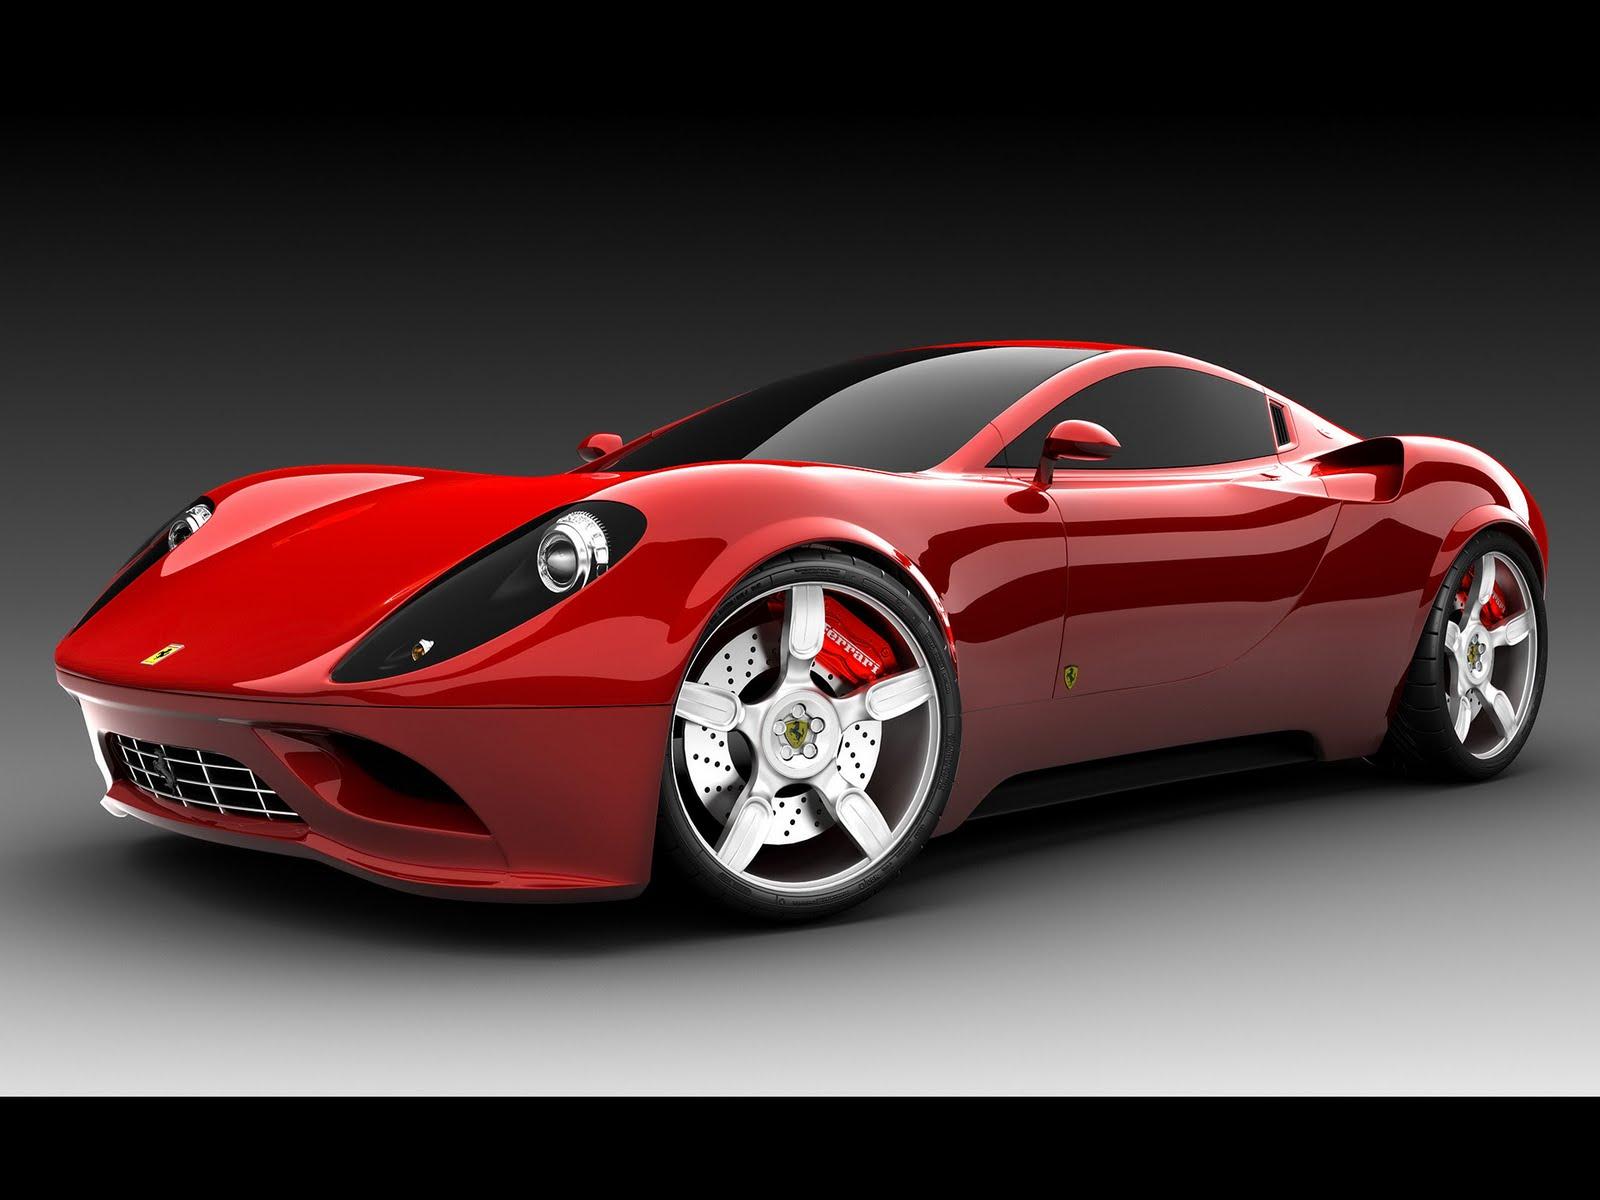 http://1.bp.blogspot.com/-5xwFgwb-hNQ/TiLRv_kU0xI/AAAAAAAAAQk/Xh1QzCKU4UI/s1600/Ferrari+Wallpaper_5.jpg